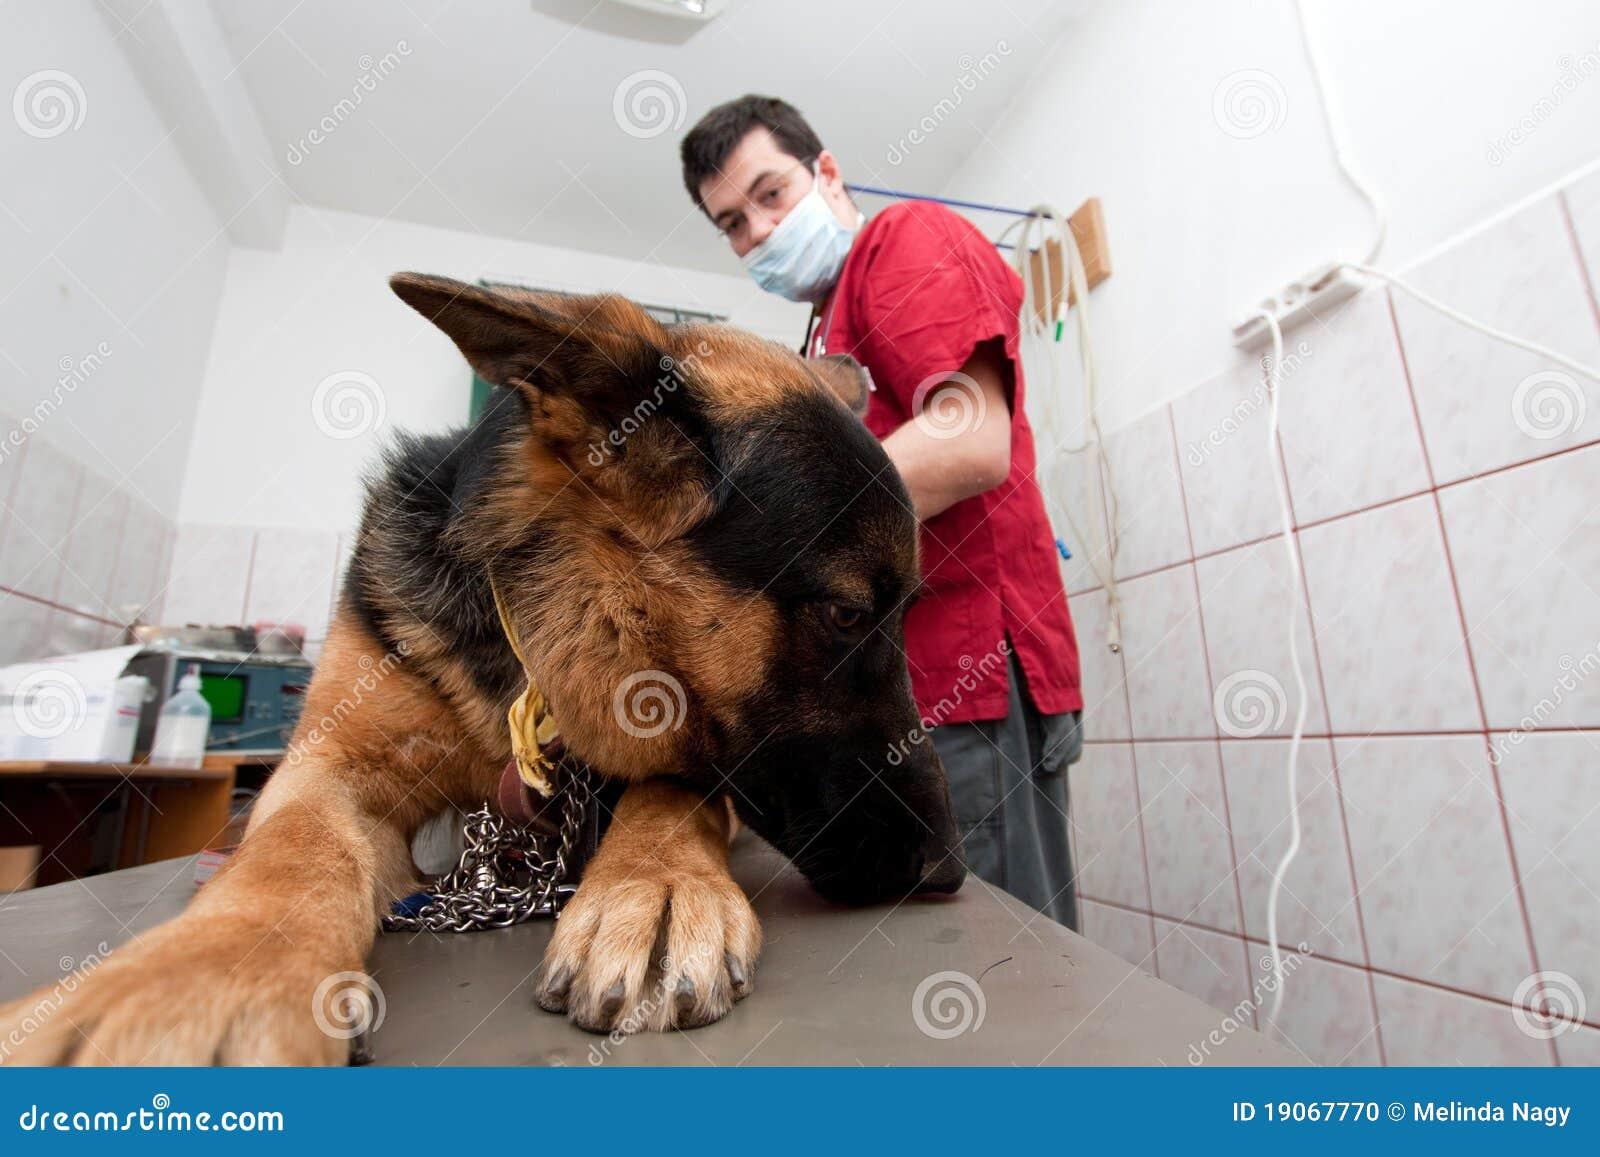 German shepherd at vet stock photo. Image of funny, health - 19067770